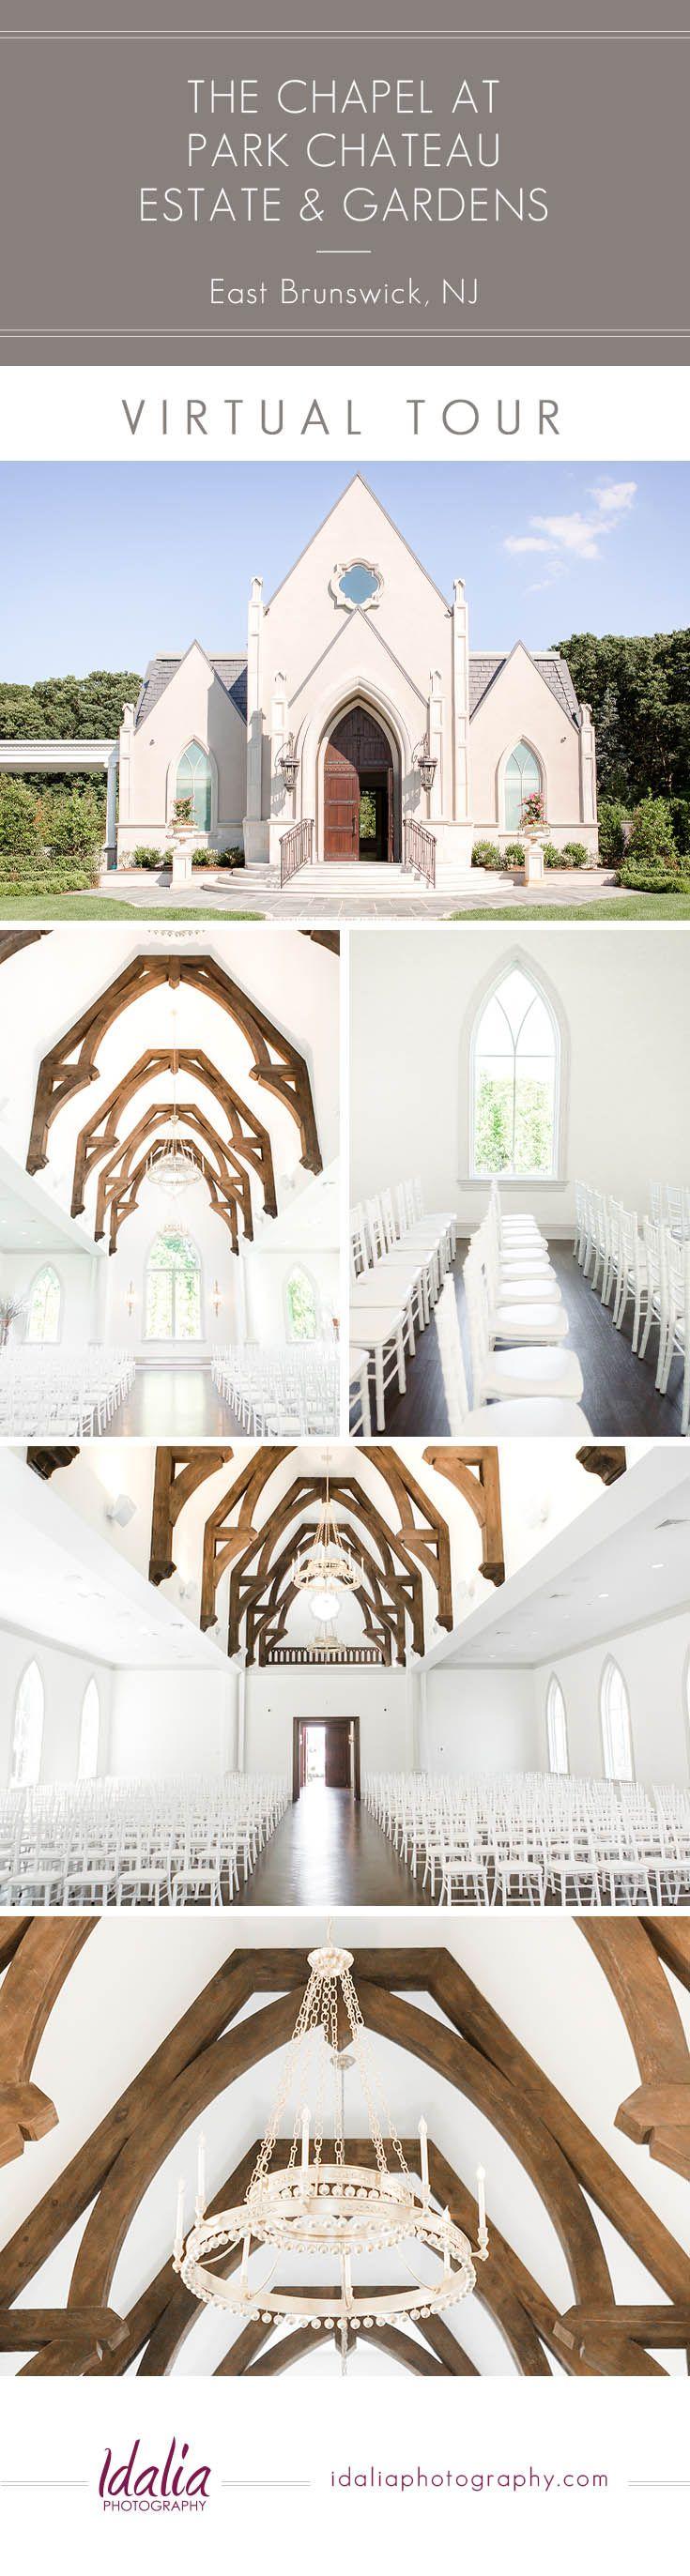 wedding venues asbury park nj%0A Virtual Tour of Chapel at Park Chateau Estate and Gardens   Luxury NJ  Wedding Venue in